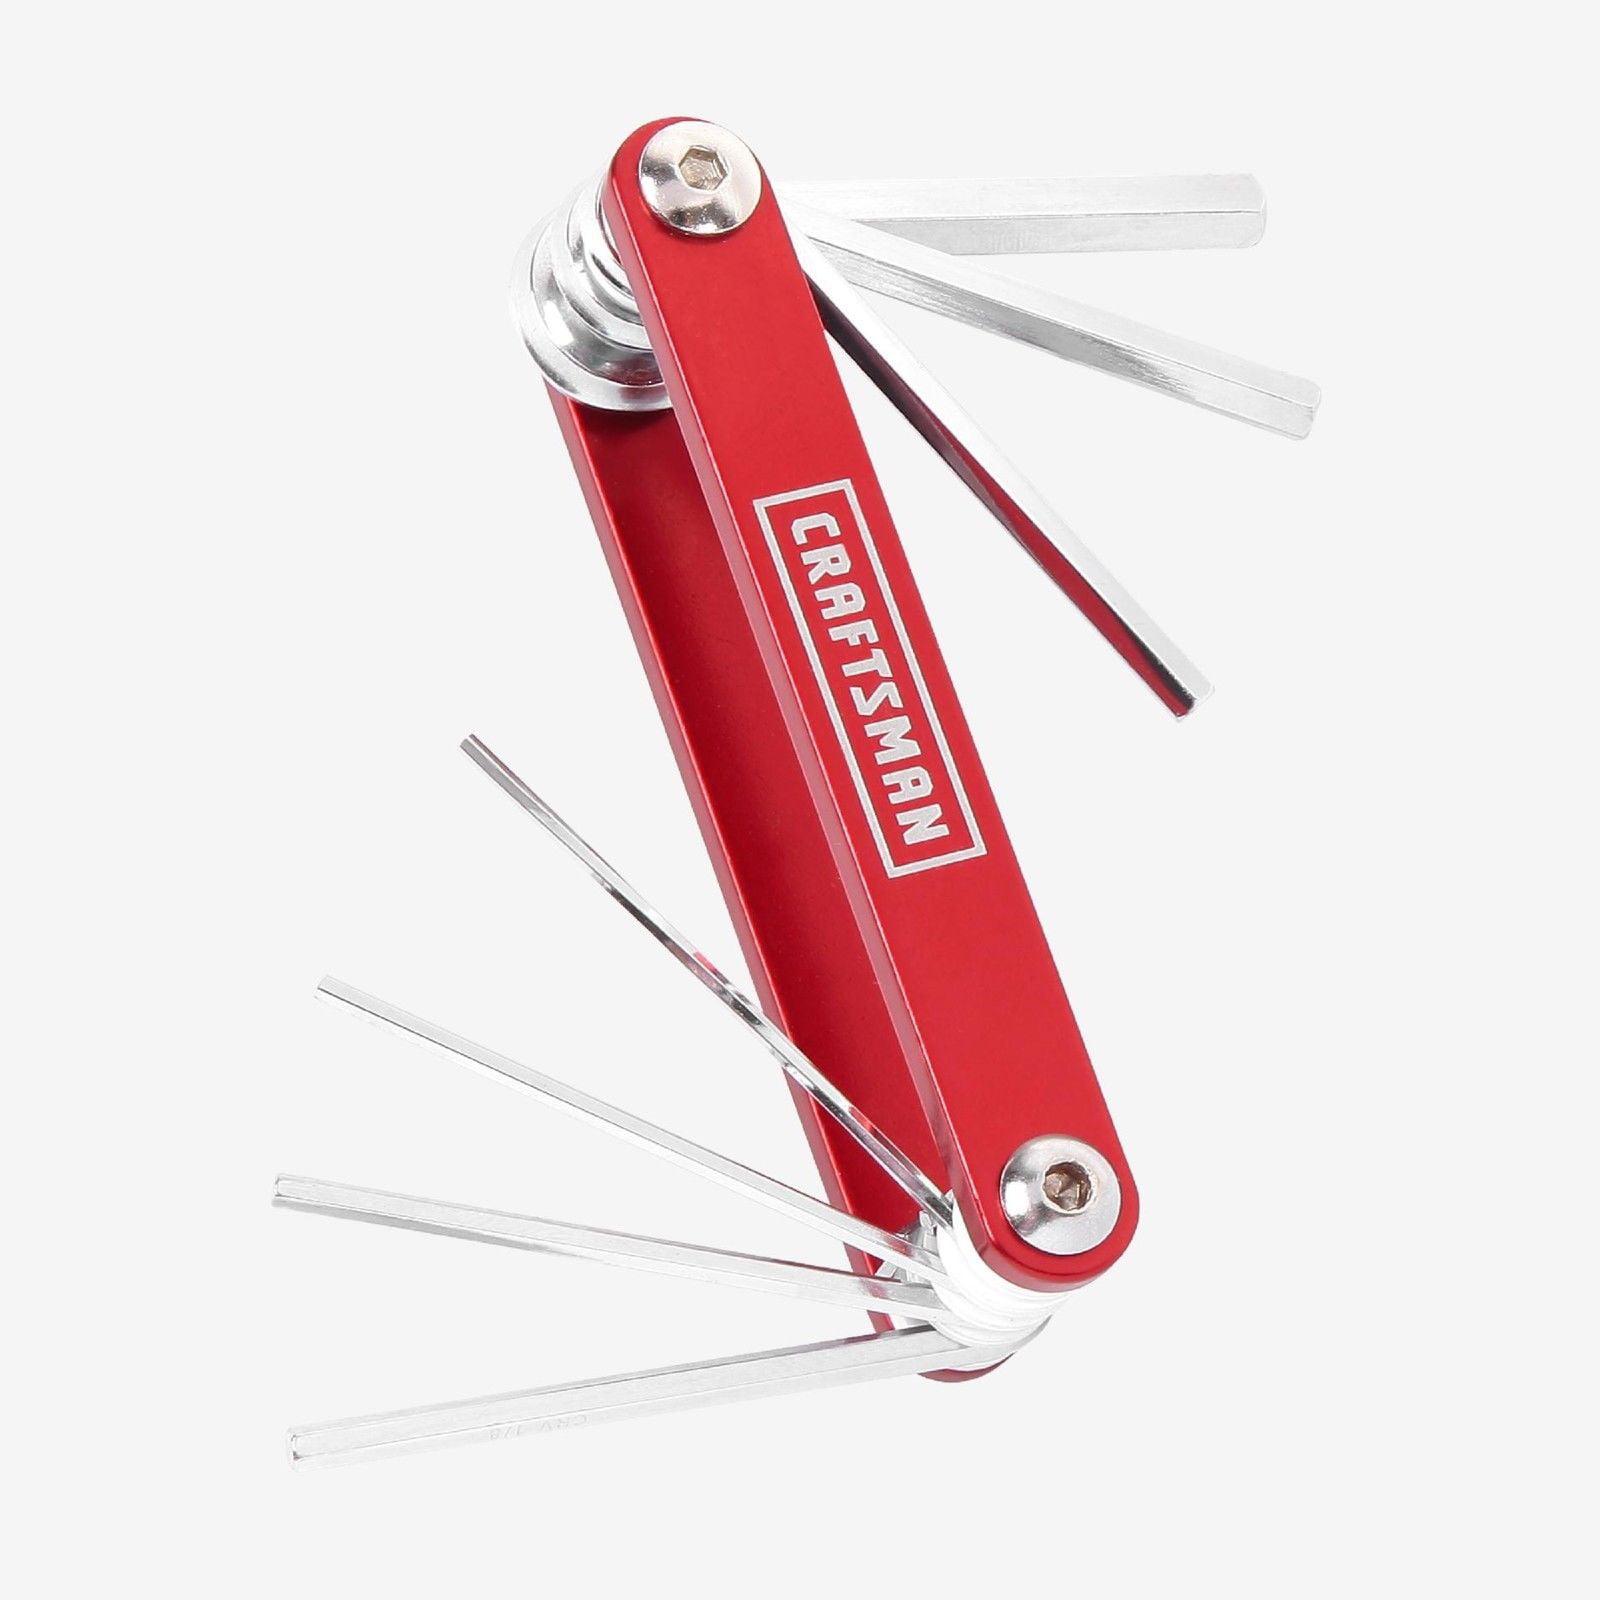 Craftsman Hex Key Set Red 7 pc. Allen Wrench SAE Metric Foldable Folding Pocket Handle CRV Hand Tool 88000